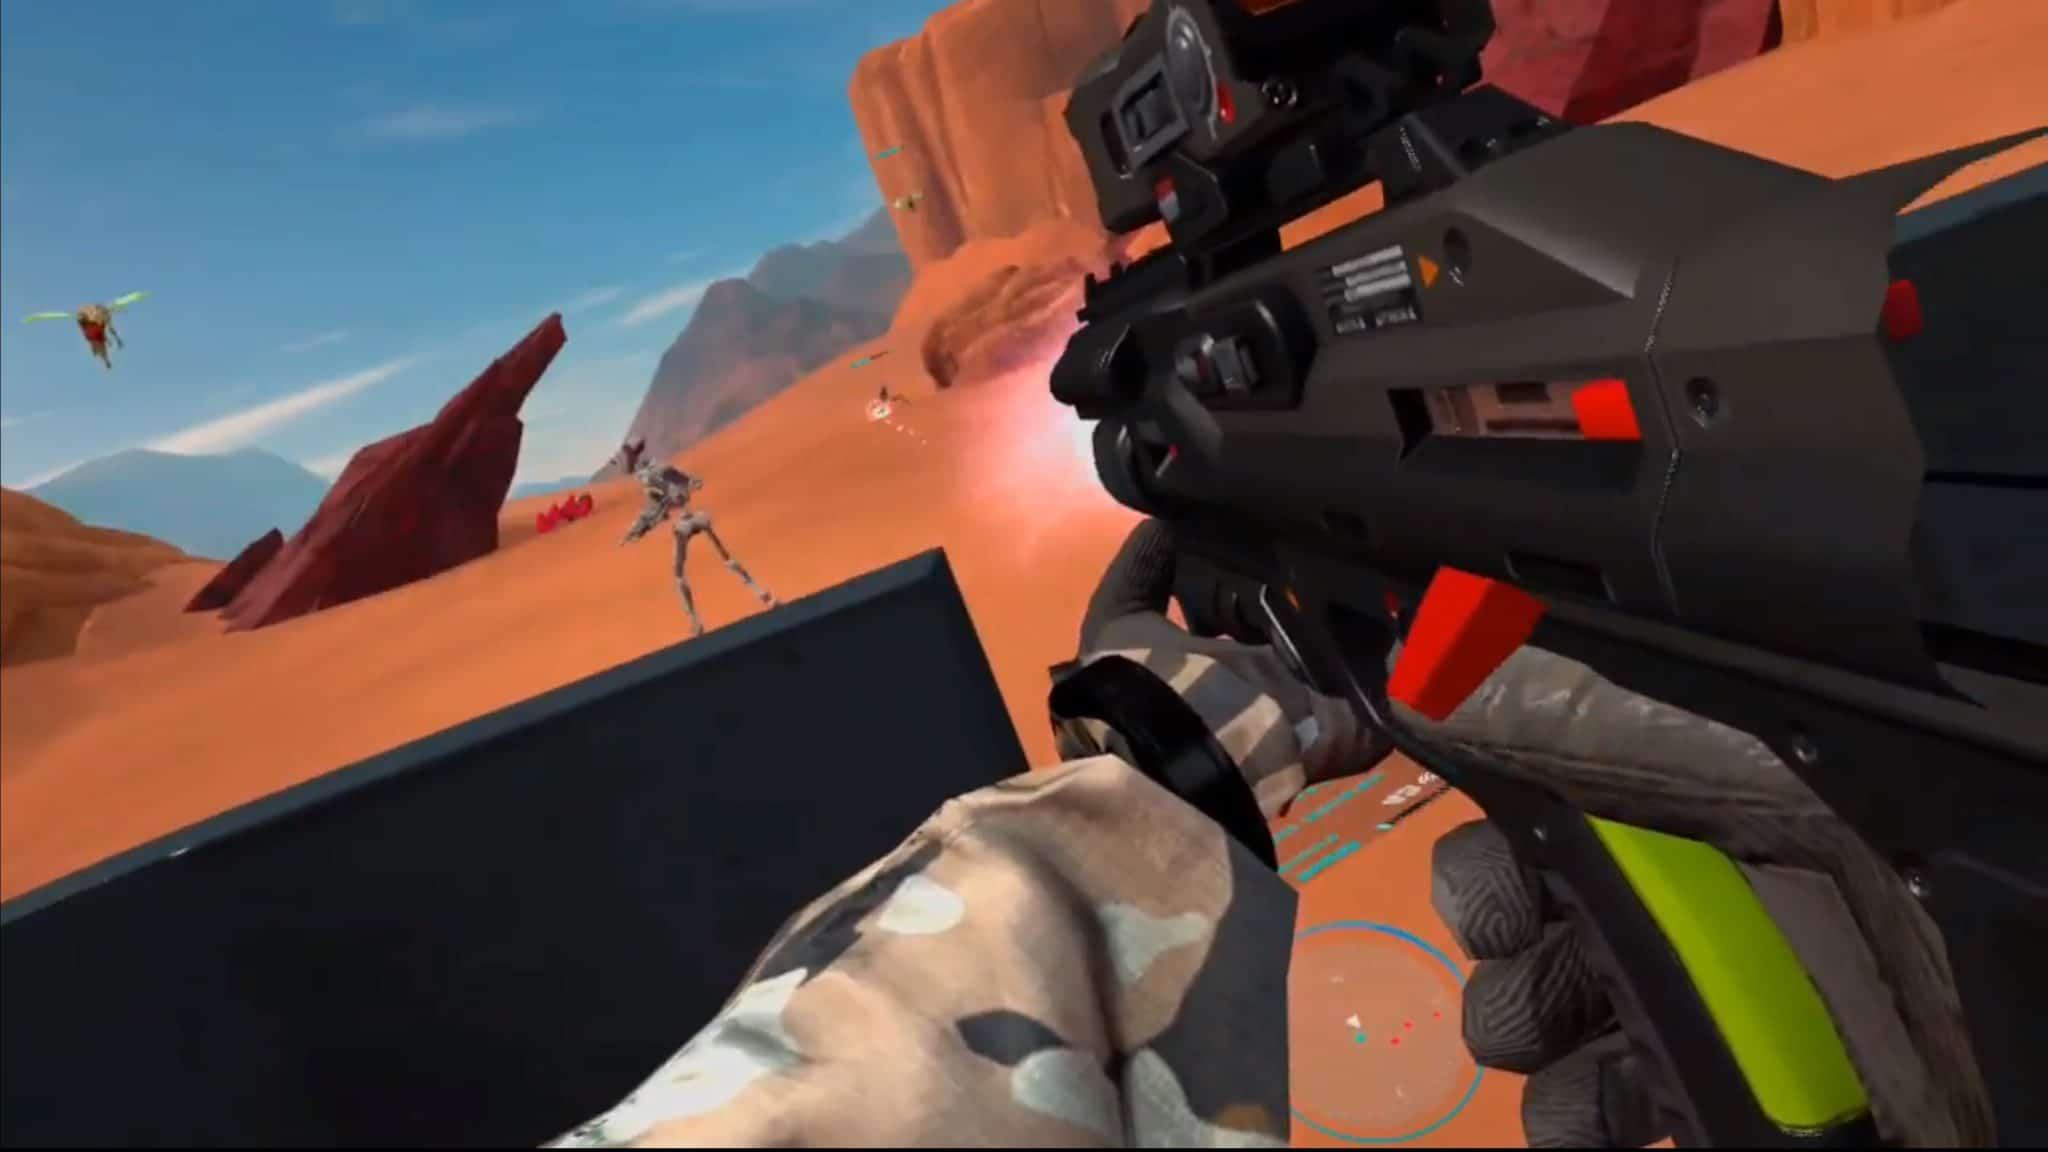 VR科幻射击游戏《Guardians》即将登陆Oculus Quest和PC VR